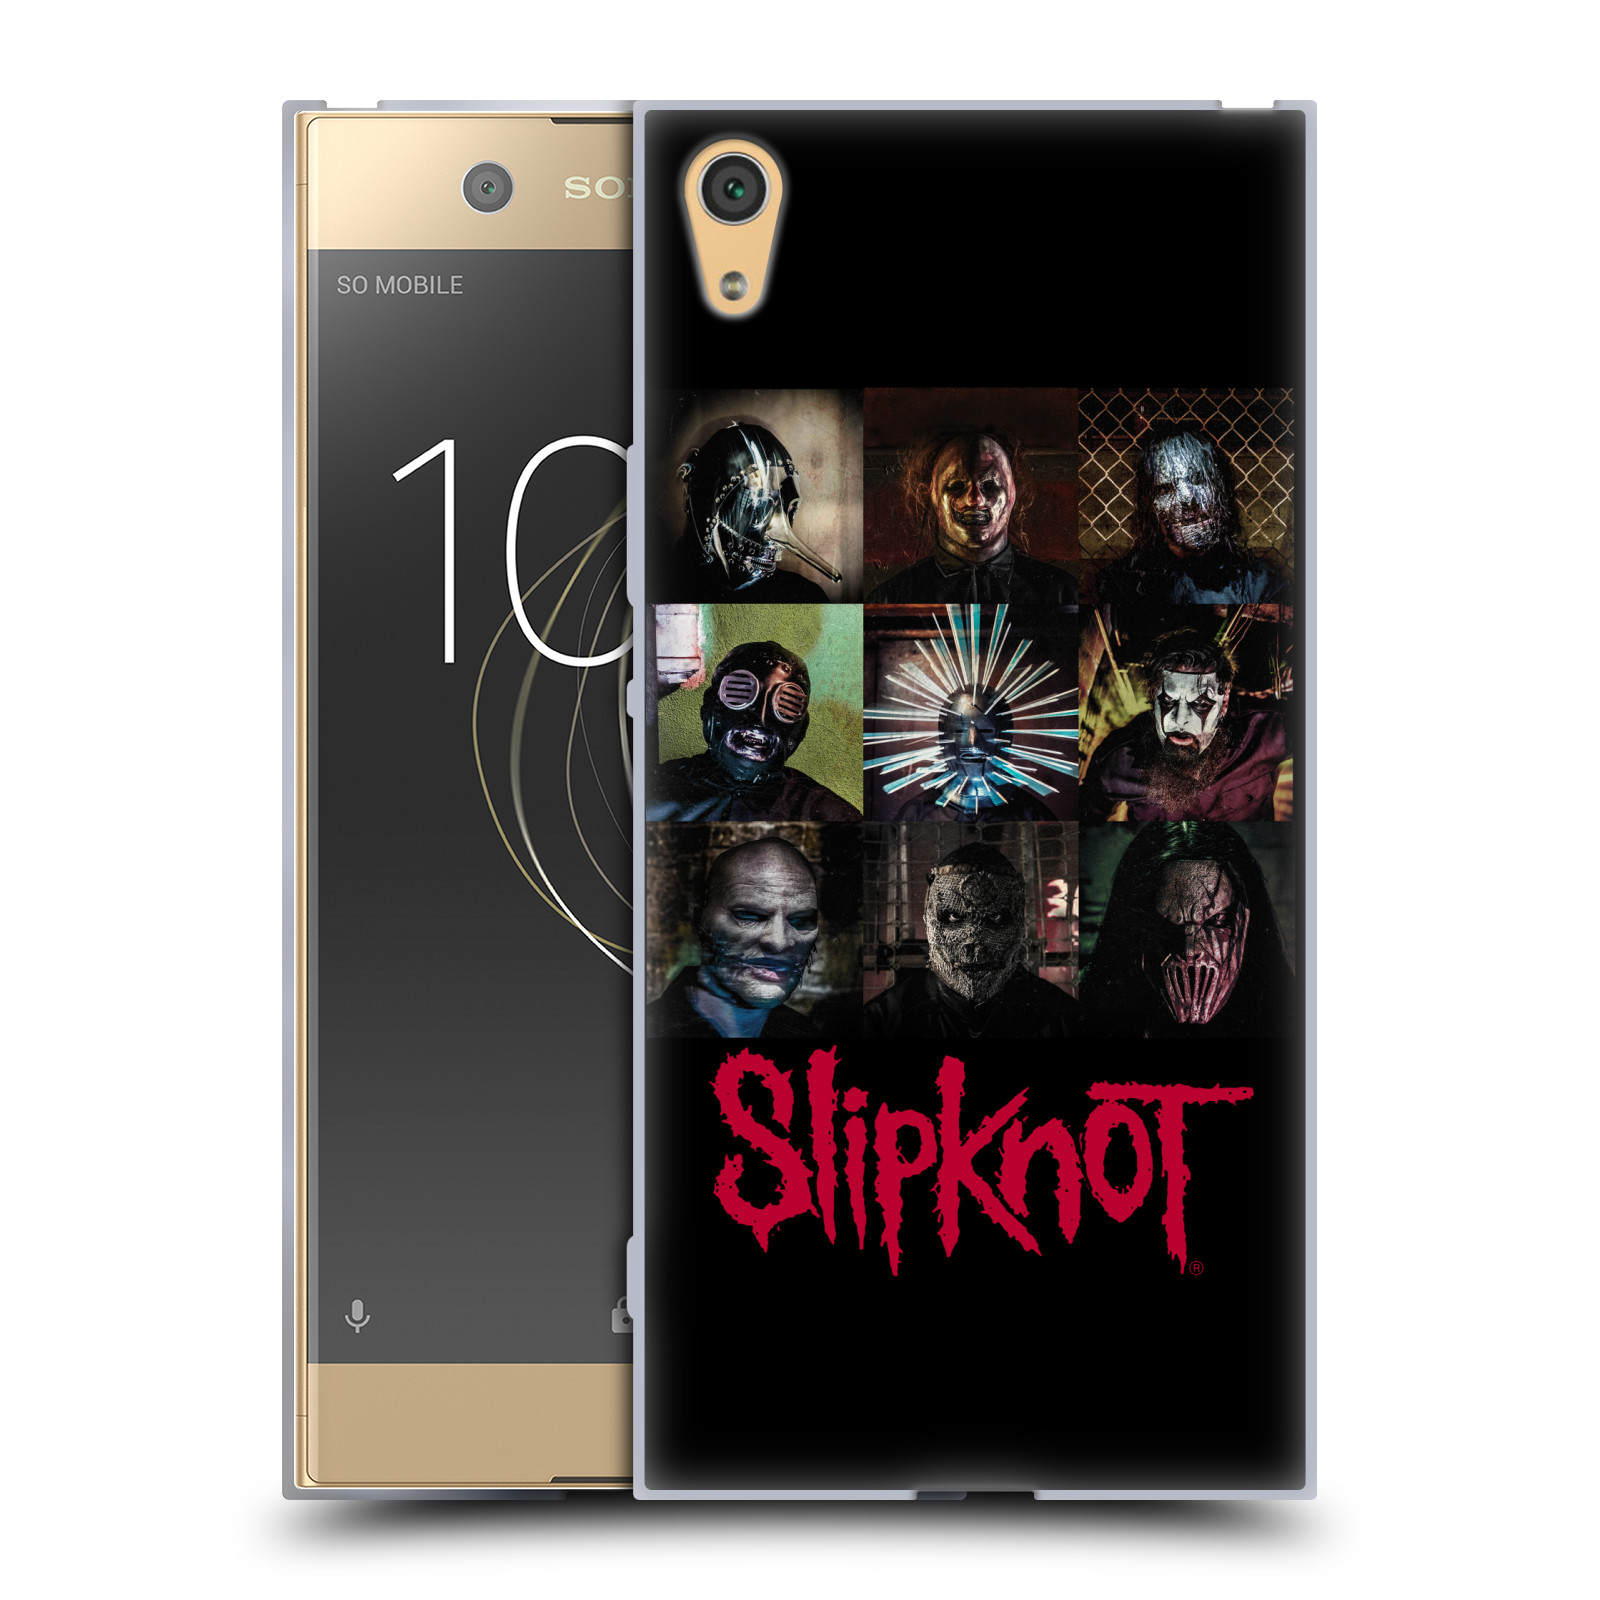 HEAD CASE silikonový obal na mobil Sony Xperia XA1 ULTRA hudební skupina Slipknot logo velké